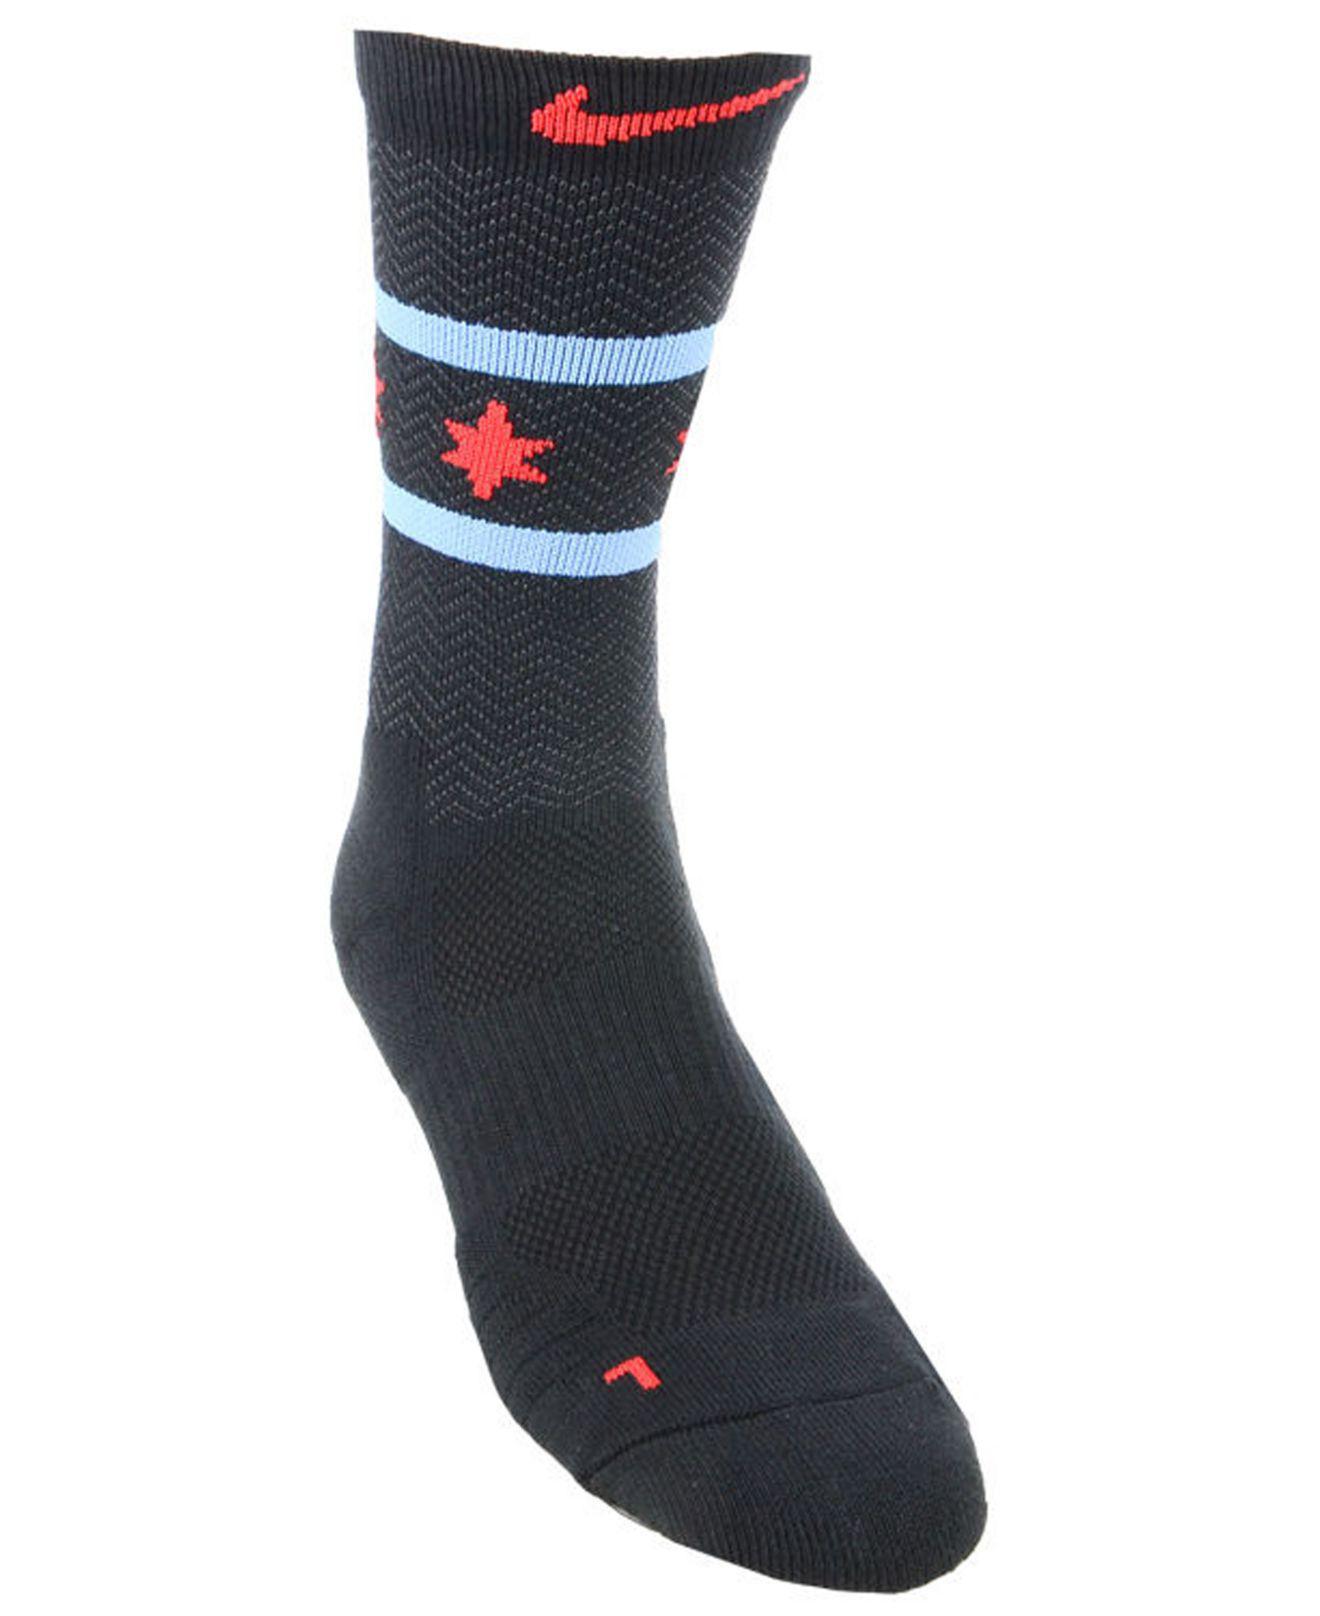 3ad3ee092 Lyst - Nike Chicago Bulls City Edition Elite Crew Socks in Black for Men